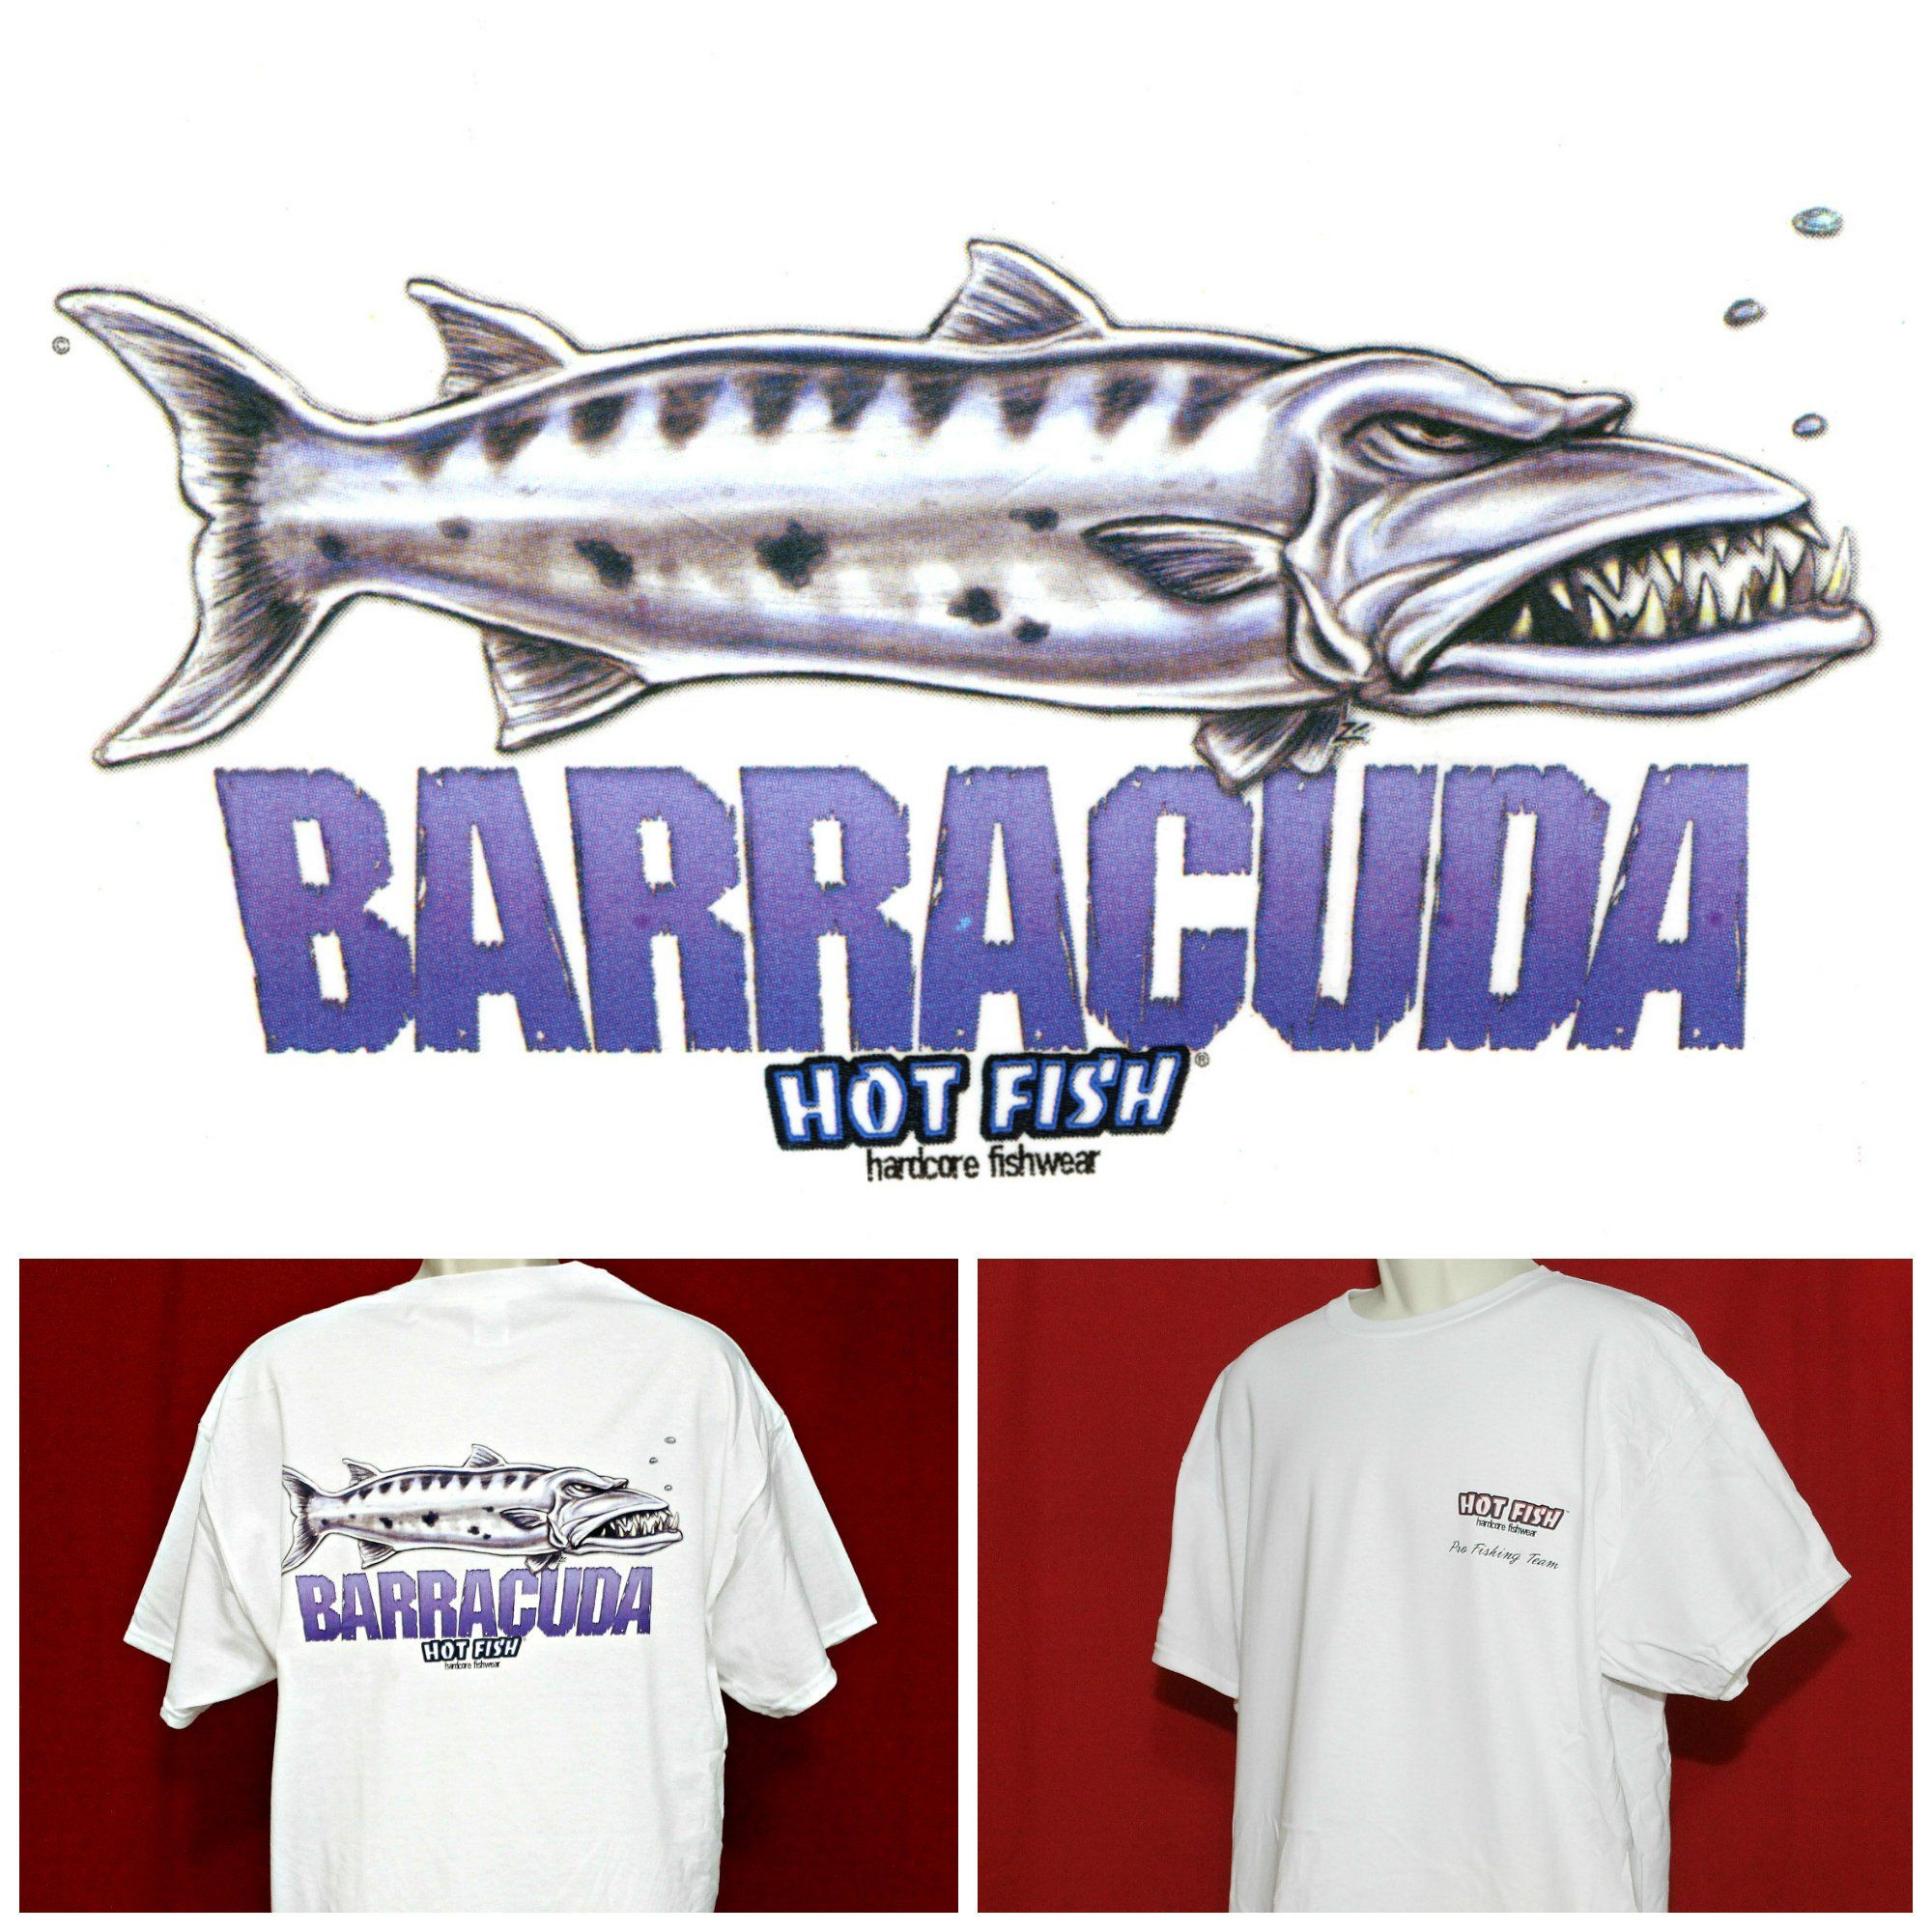 36fc80a98ac7 Grumpy Angry Funny Fish Shirt BARRACUDA Hot Fish Fisherman Fishing Gift T- shirt Nautical Design by GAFFShirts on Etsy